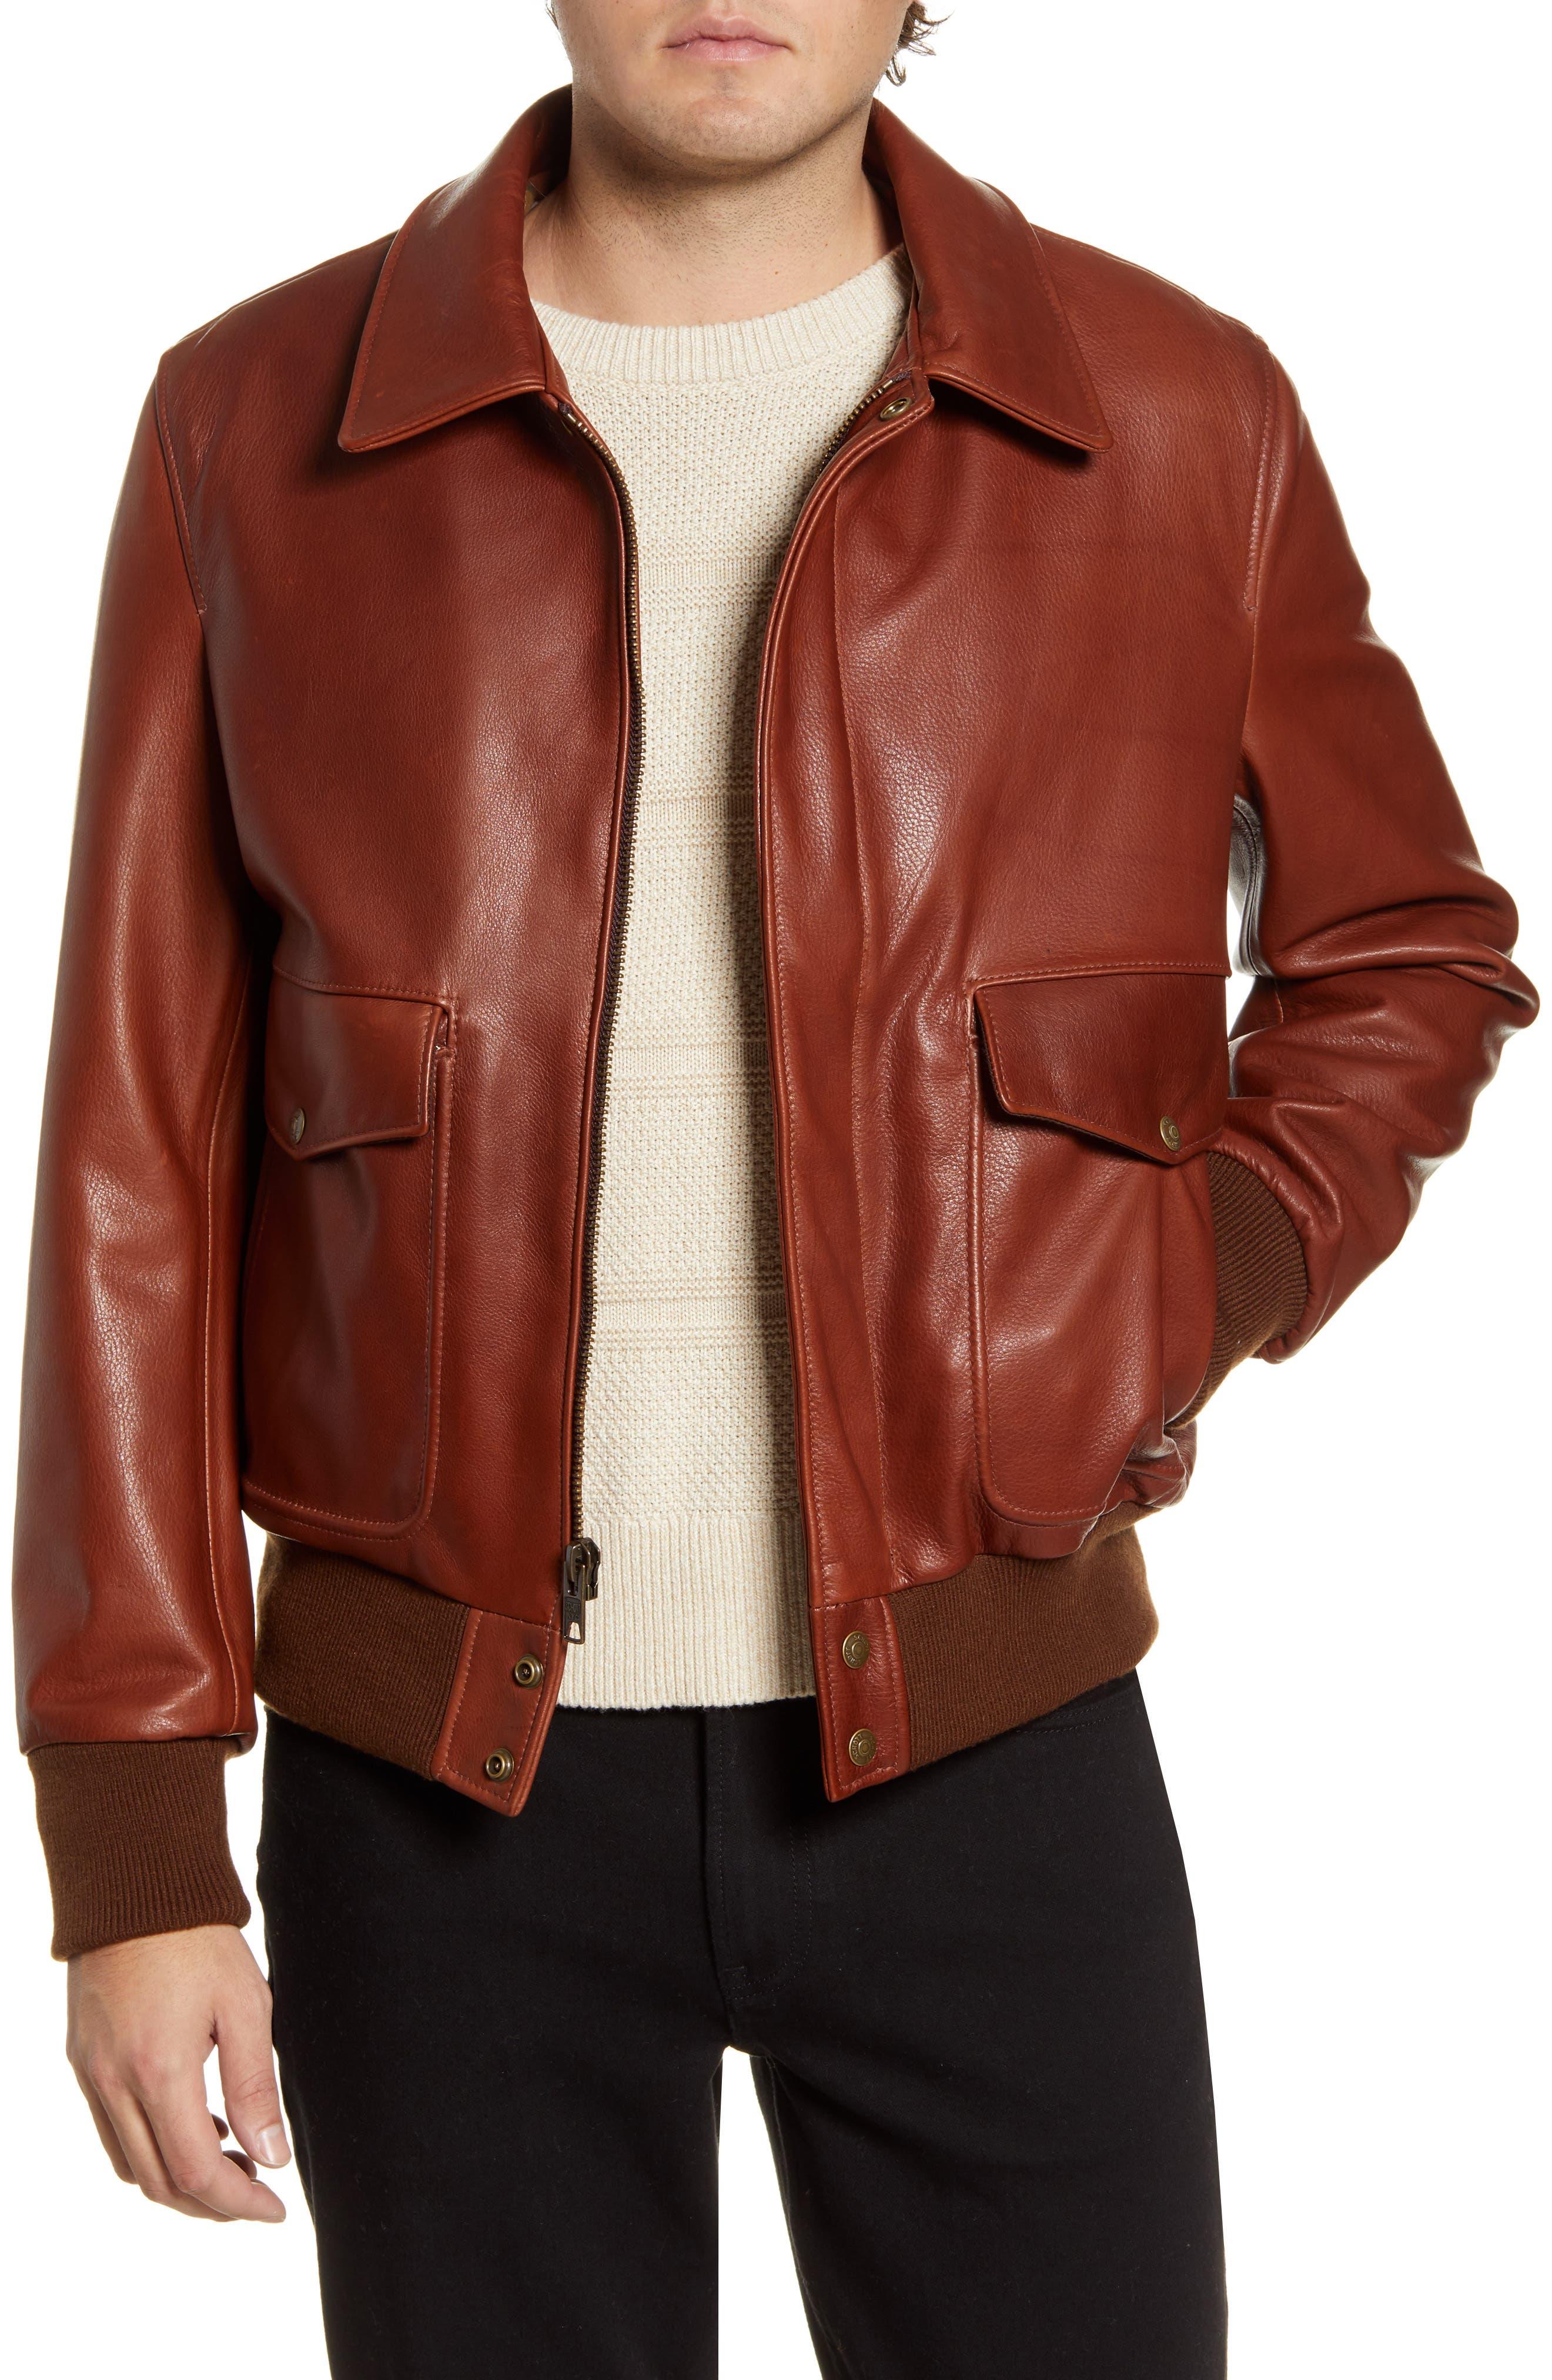 1920s Men's Coats & Jackets History Mens Schott Nyc Pebble Texture Leather Bomber Jacket $825.00 AT vintagedancer.com